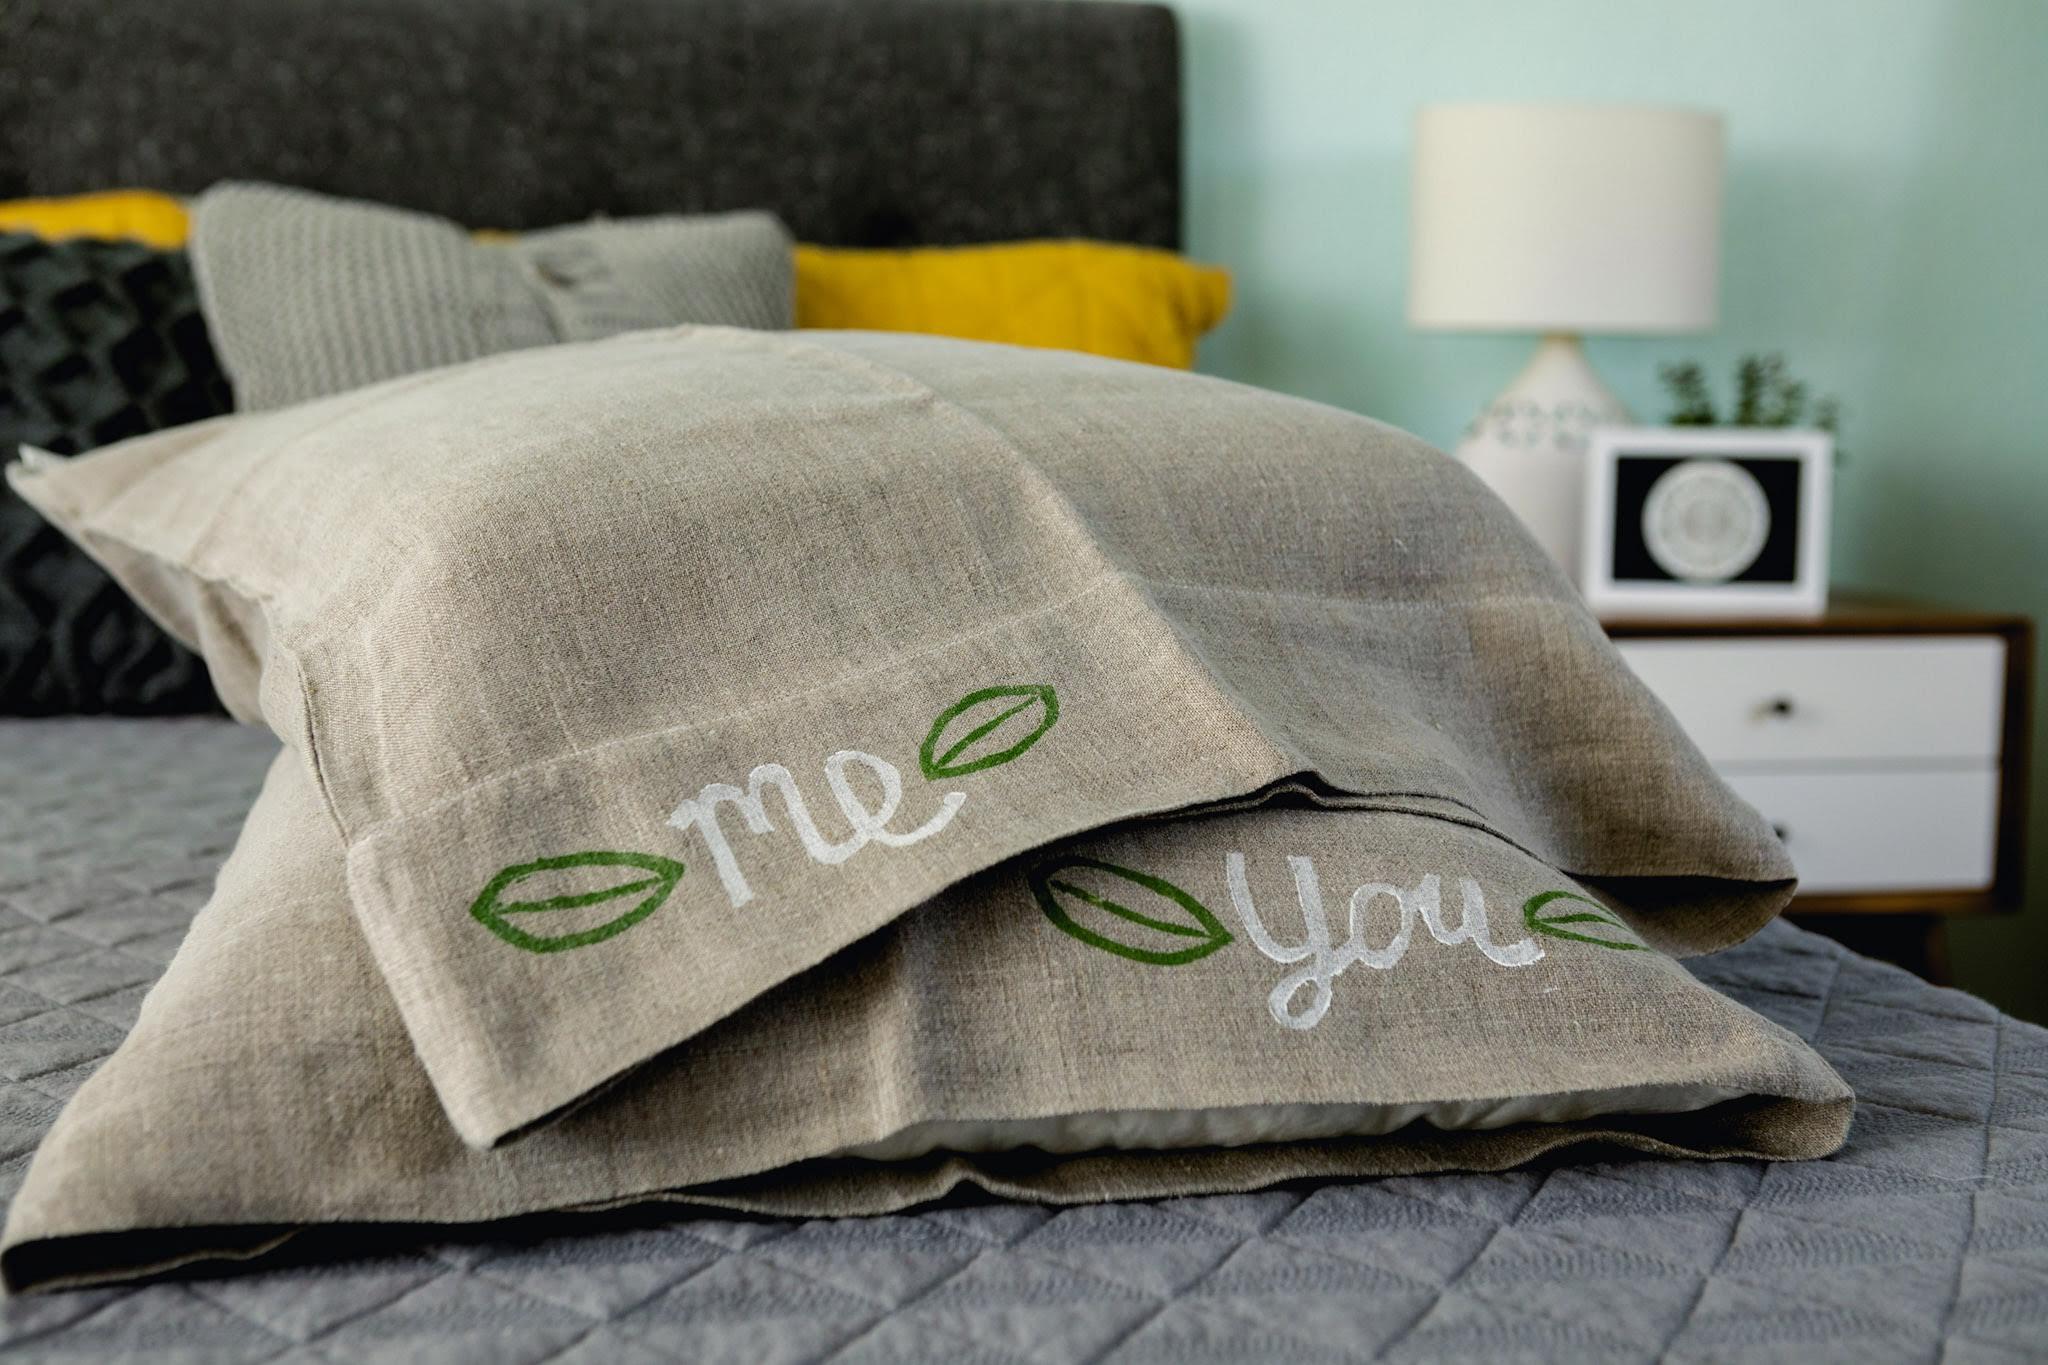 Home Again ME and YOU pillows reshoot 03.jpg